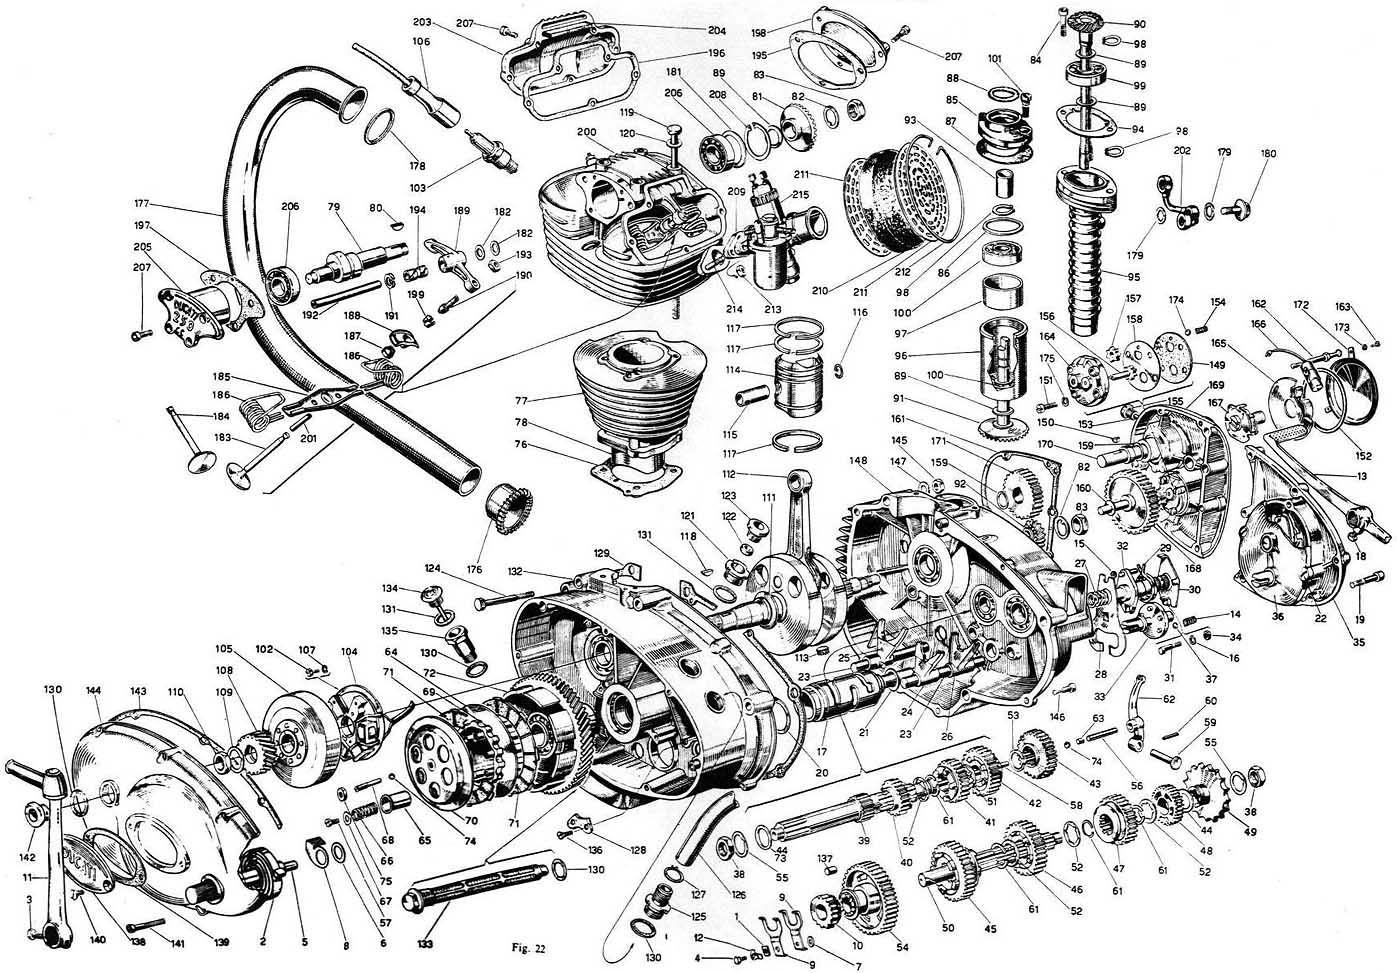 Ducati Engine Diagram Electrical Wiring Diagrams Maybach Scrambler Parts Motorbk Co